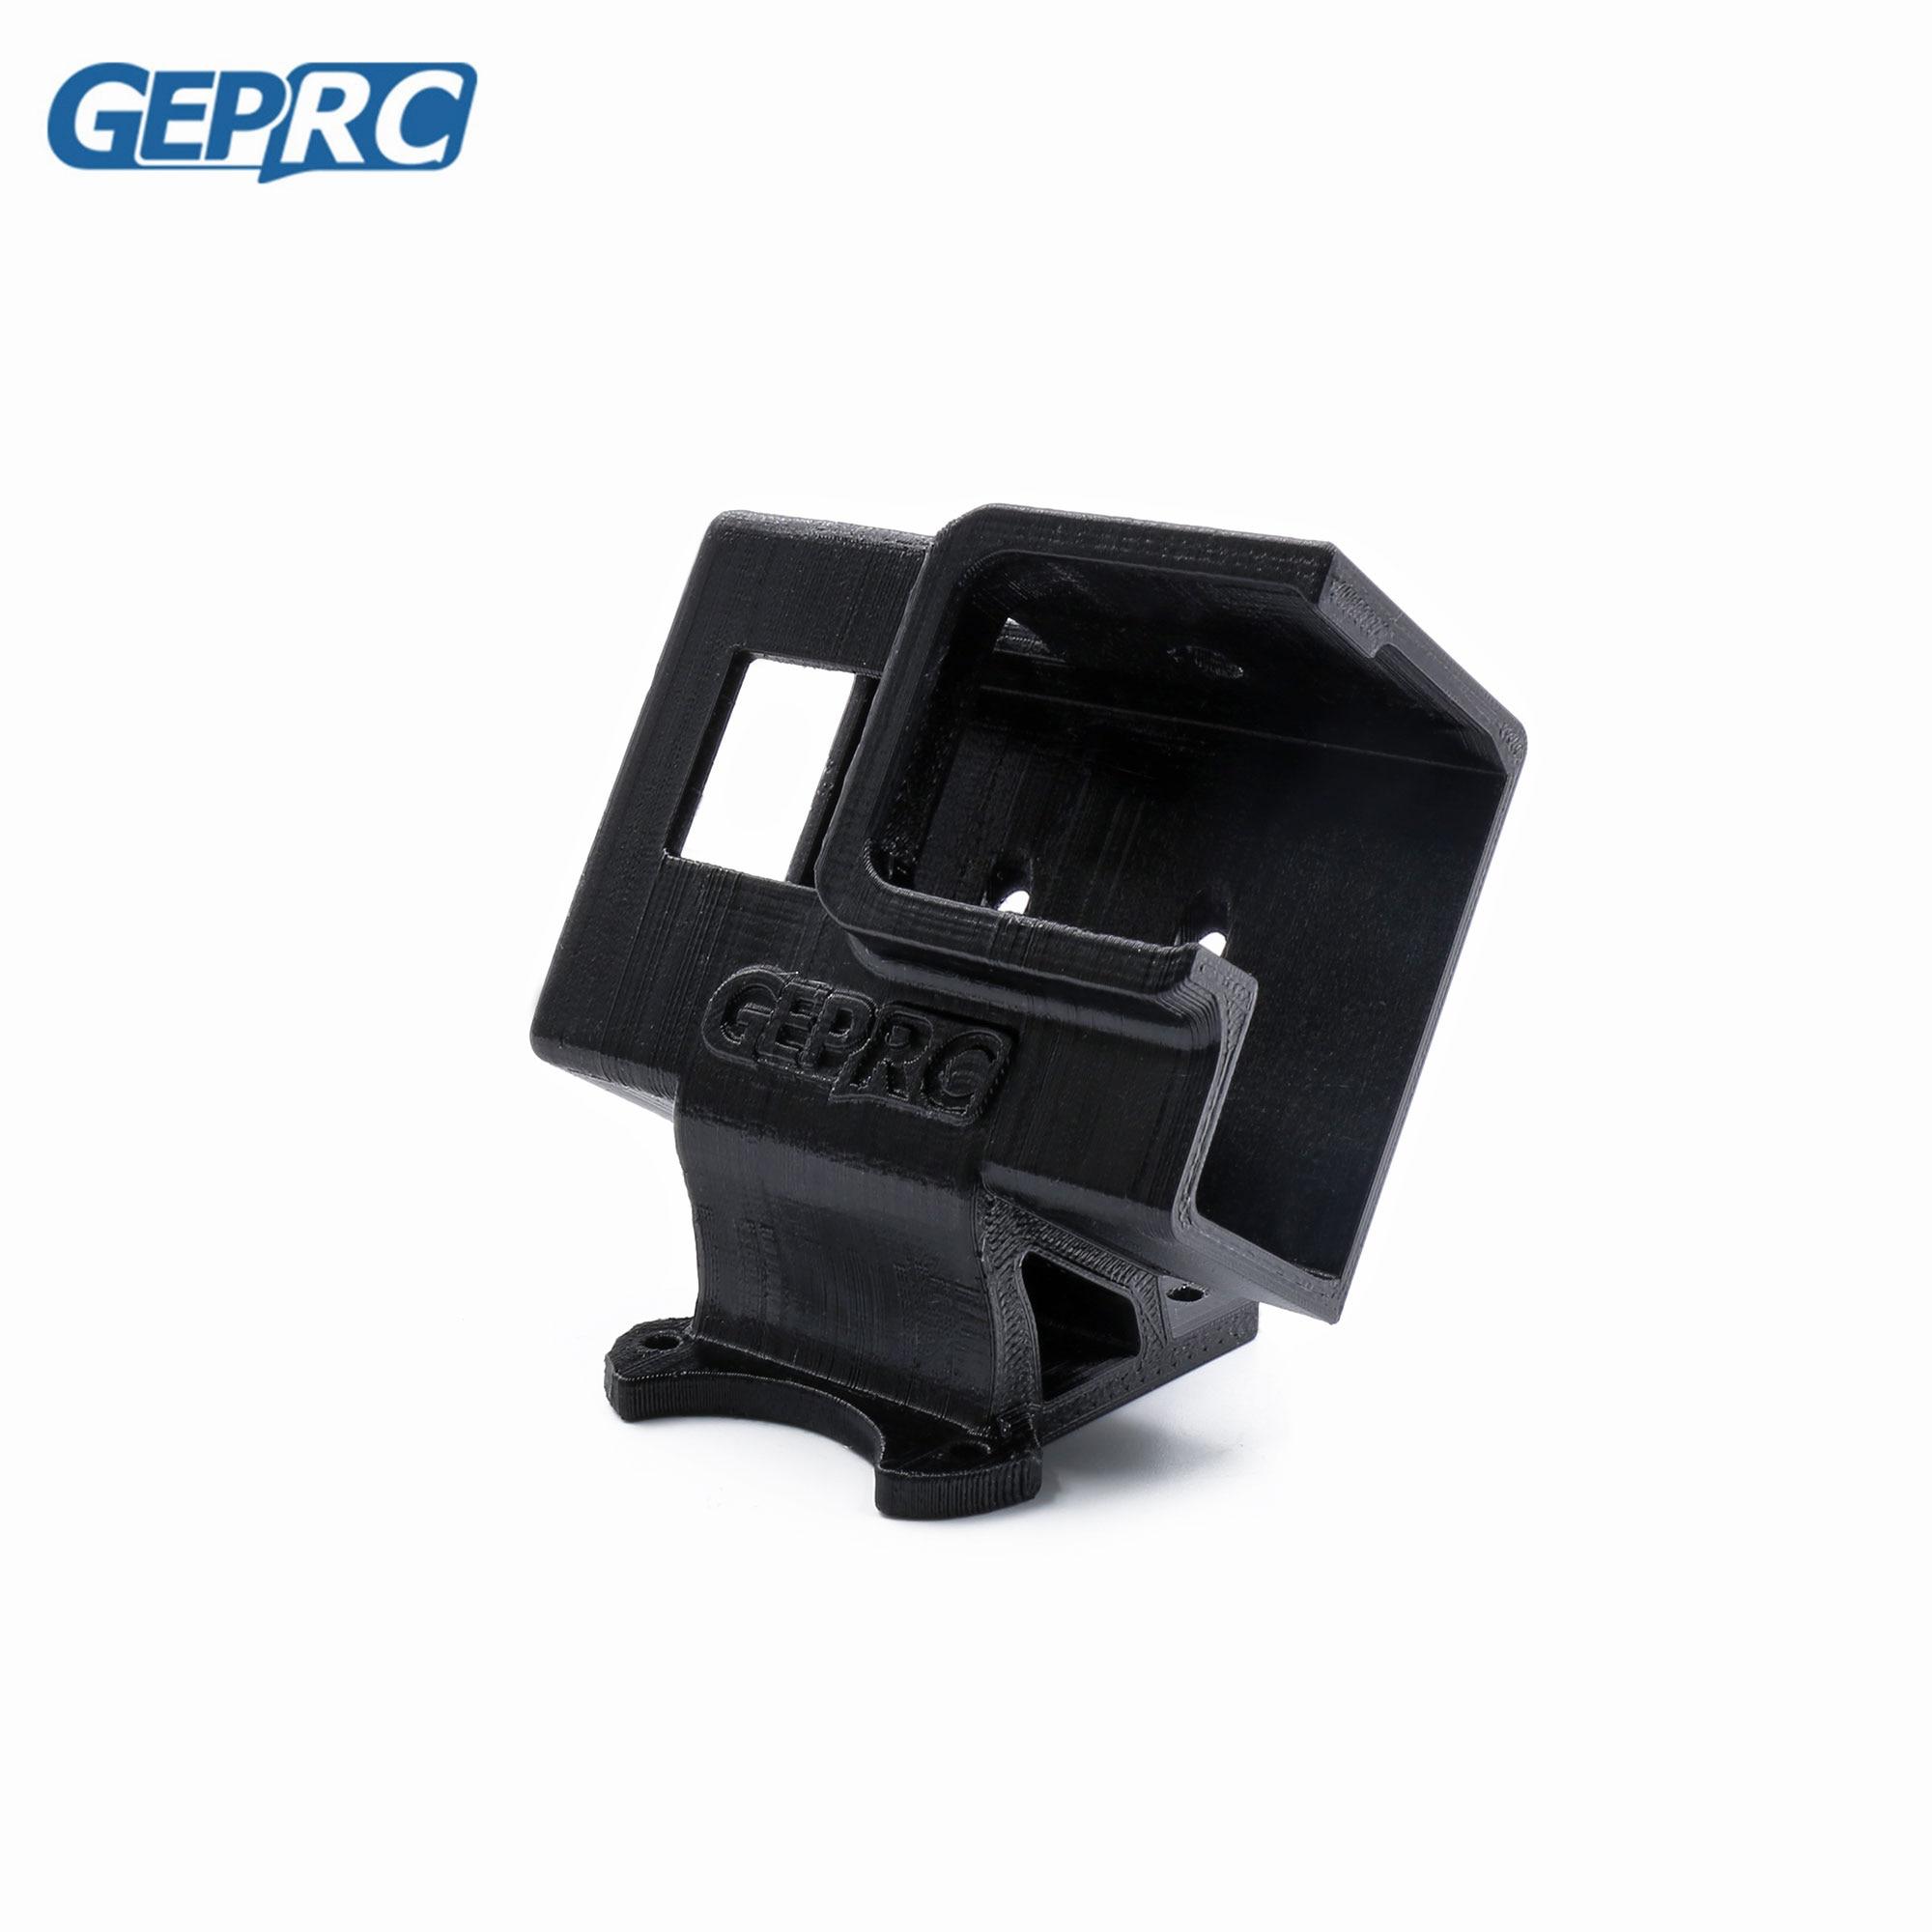 Gopro7 3D печать ТПУ фиксированное Крепление FPV Аксессуар для GEPRC GEP-Mark4 HD5 RC Дрон